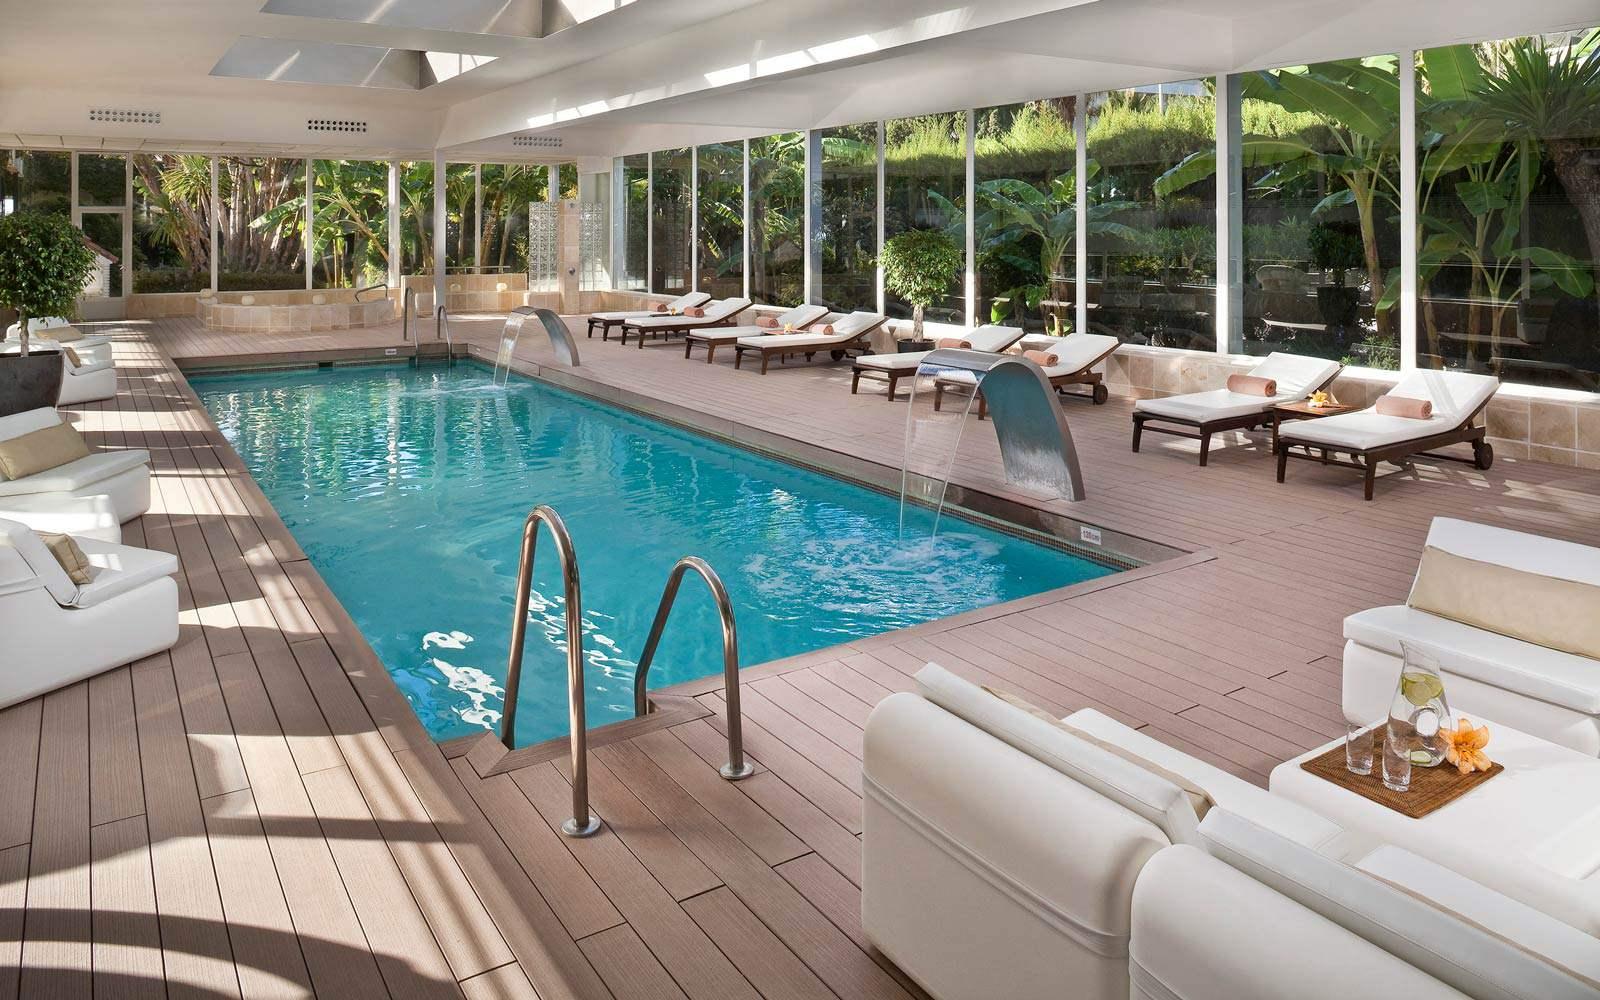 Hotel Gran Melia Don Pepe - Indoor pool